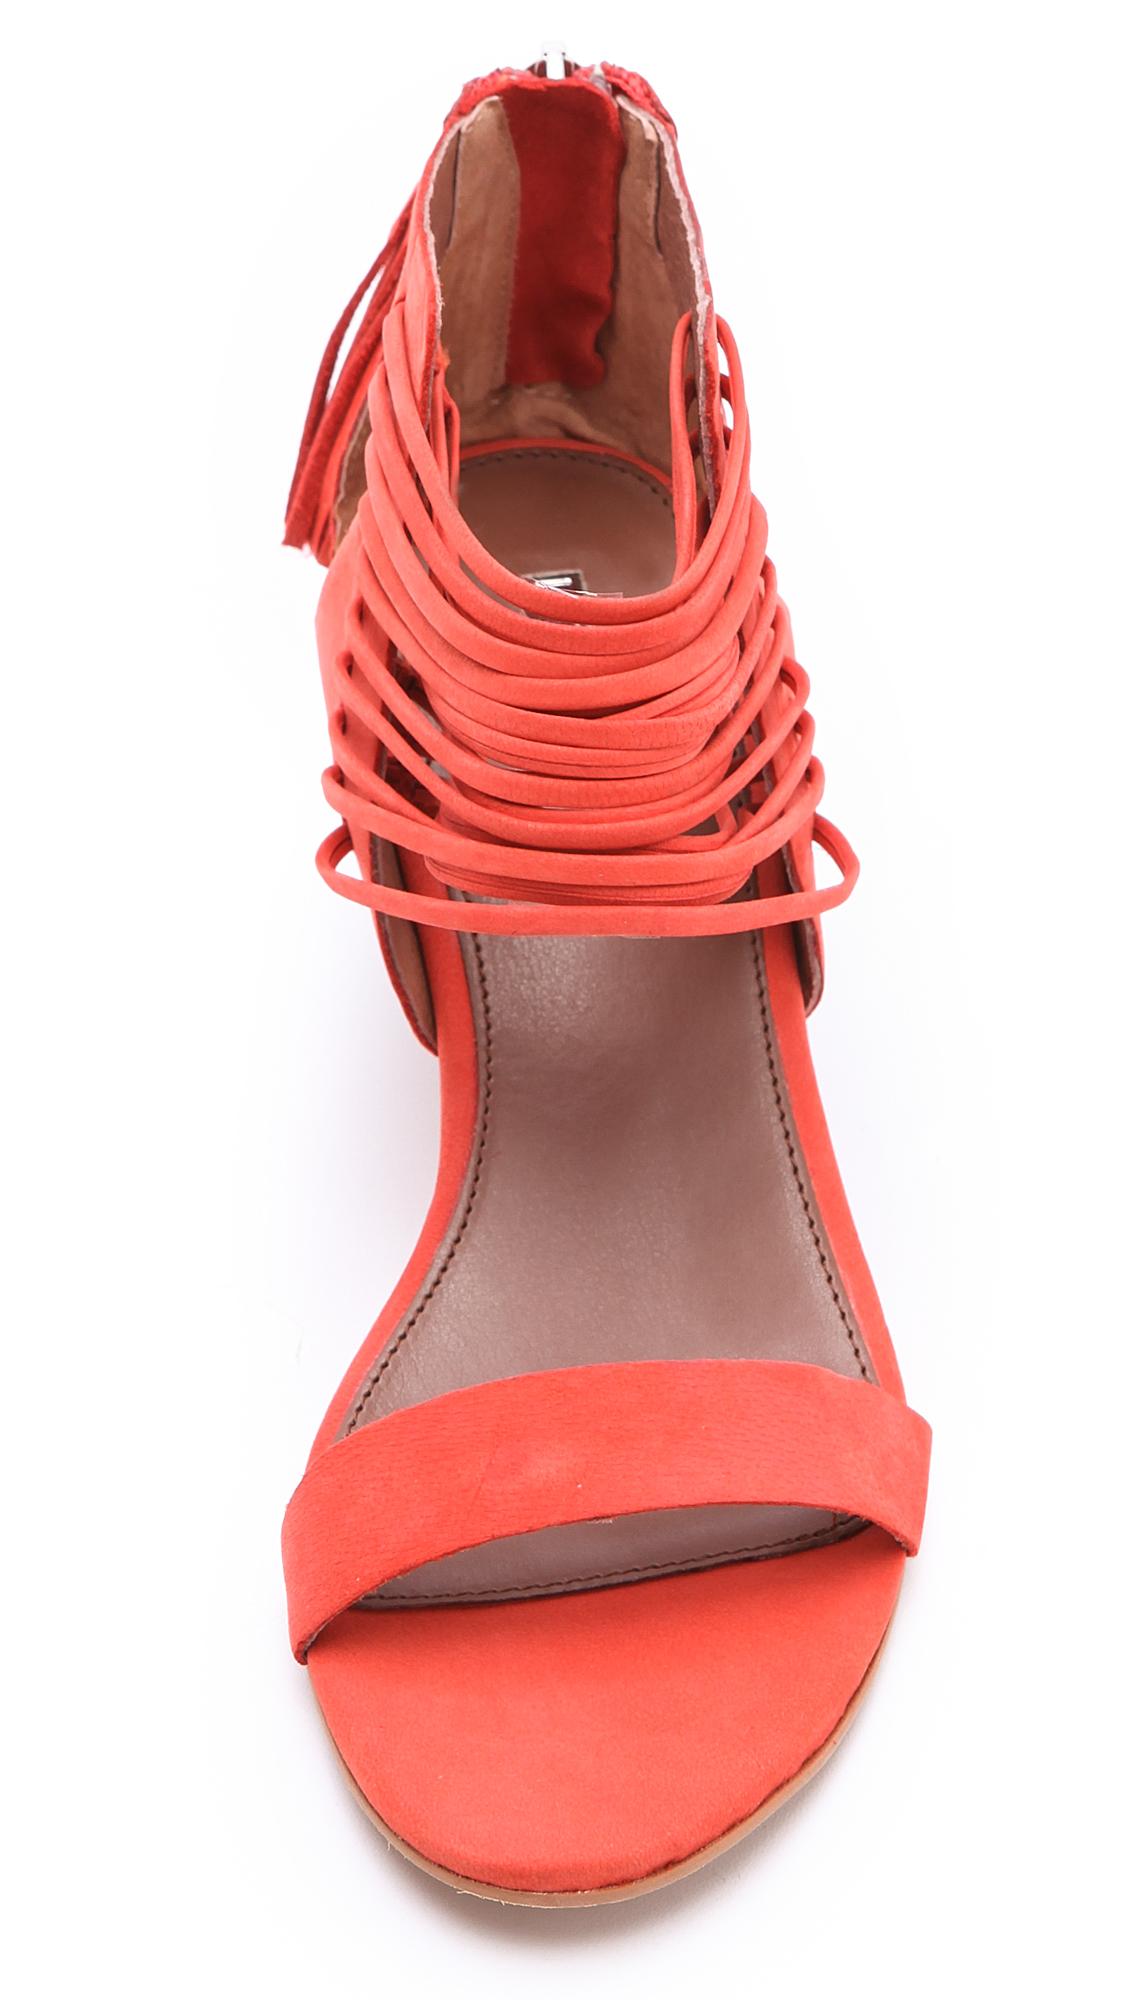 7e21ec4885f Matiko Bryn Low Sandals